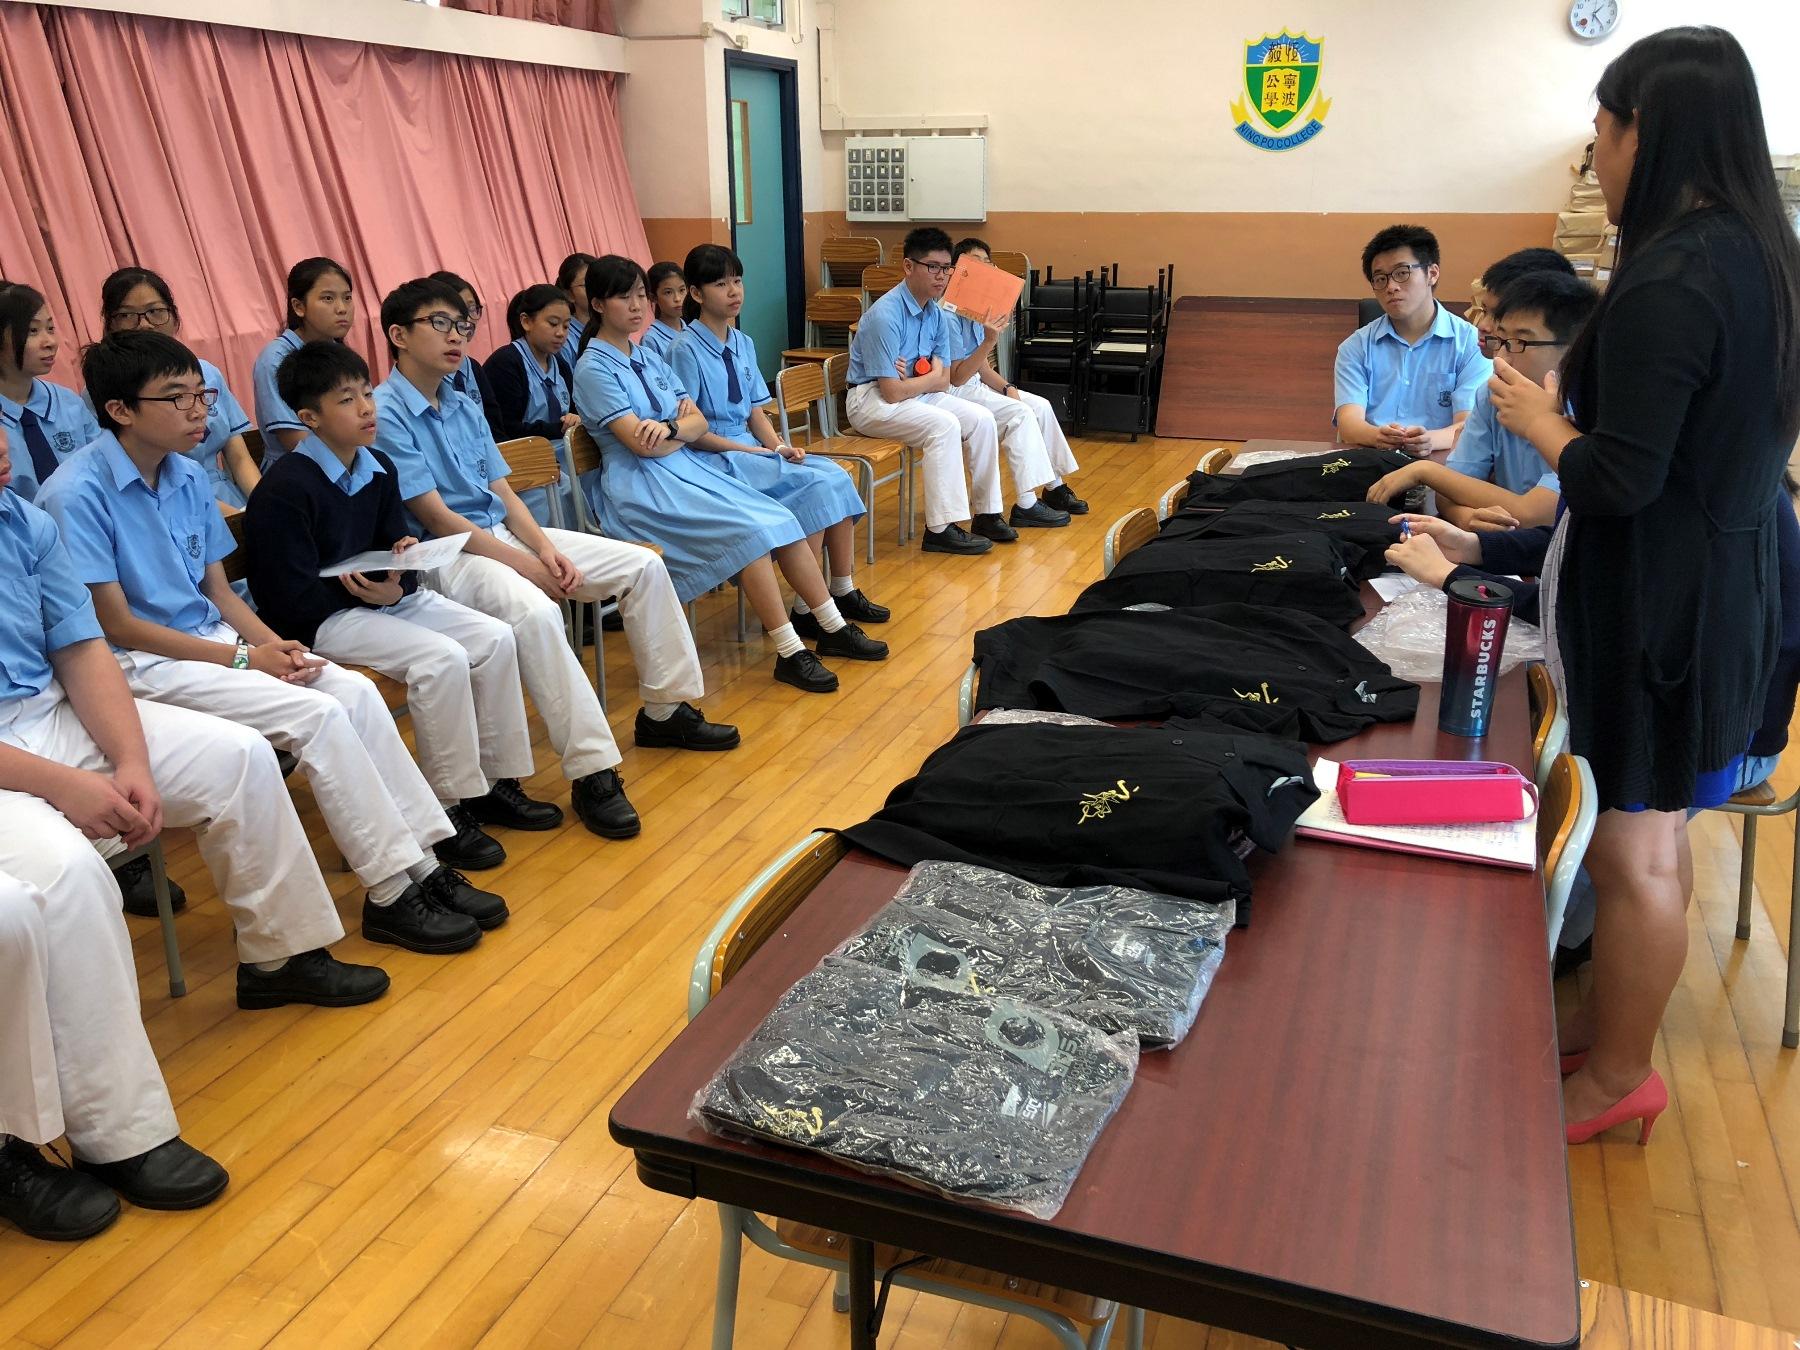 http://npc.edu.hk/sites/default/files/img_8569.jpg